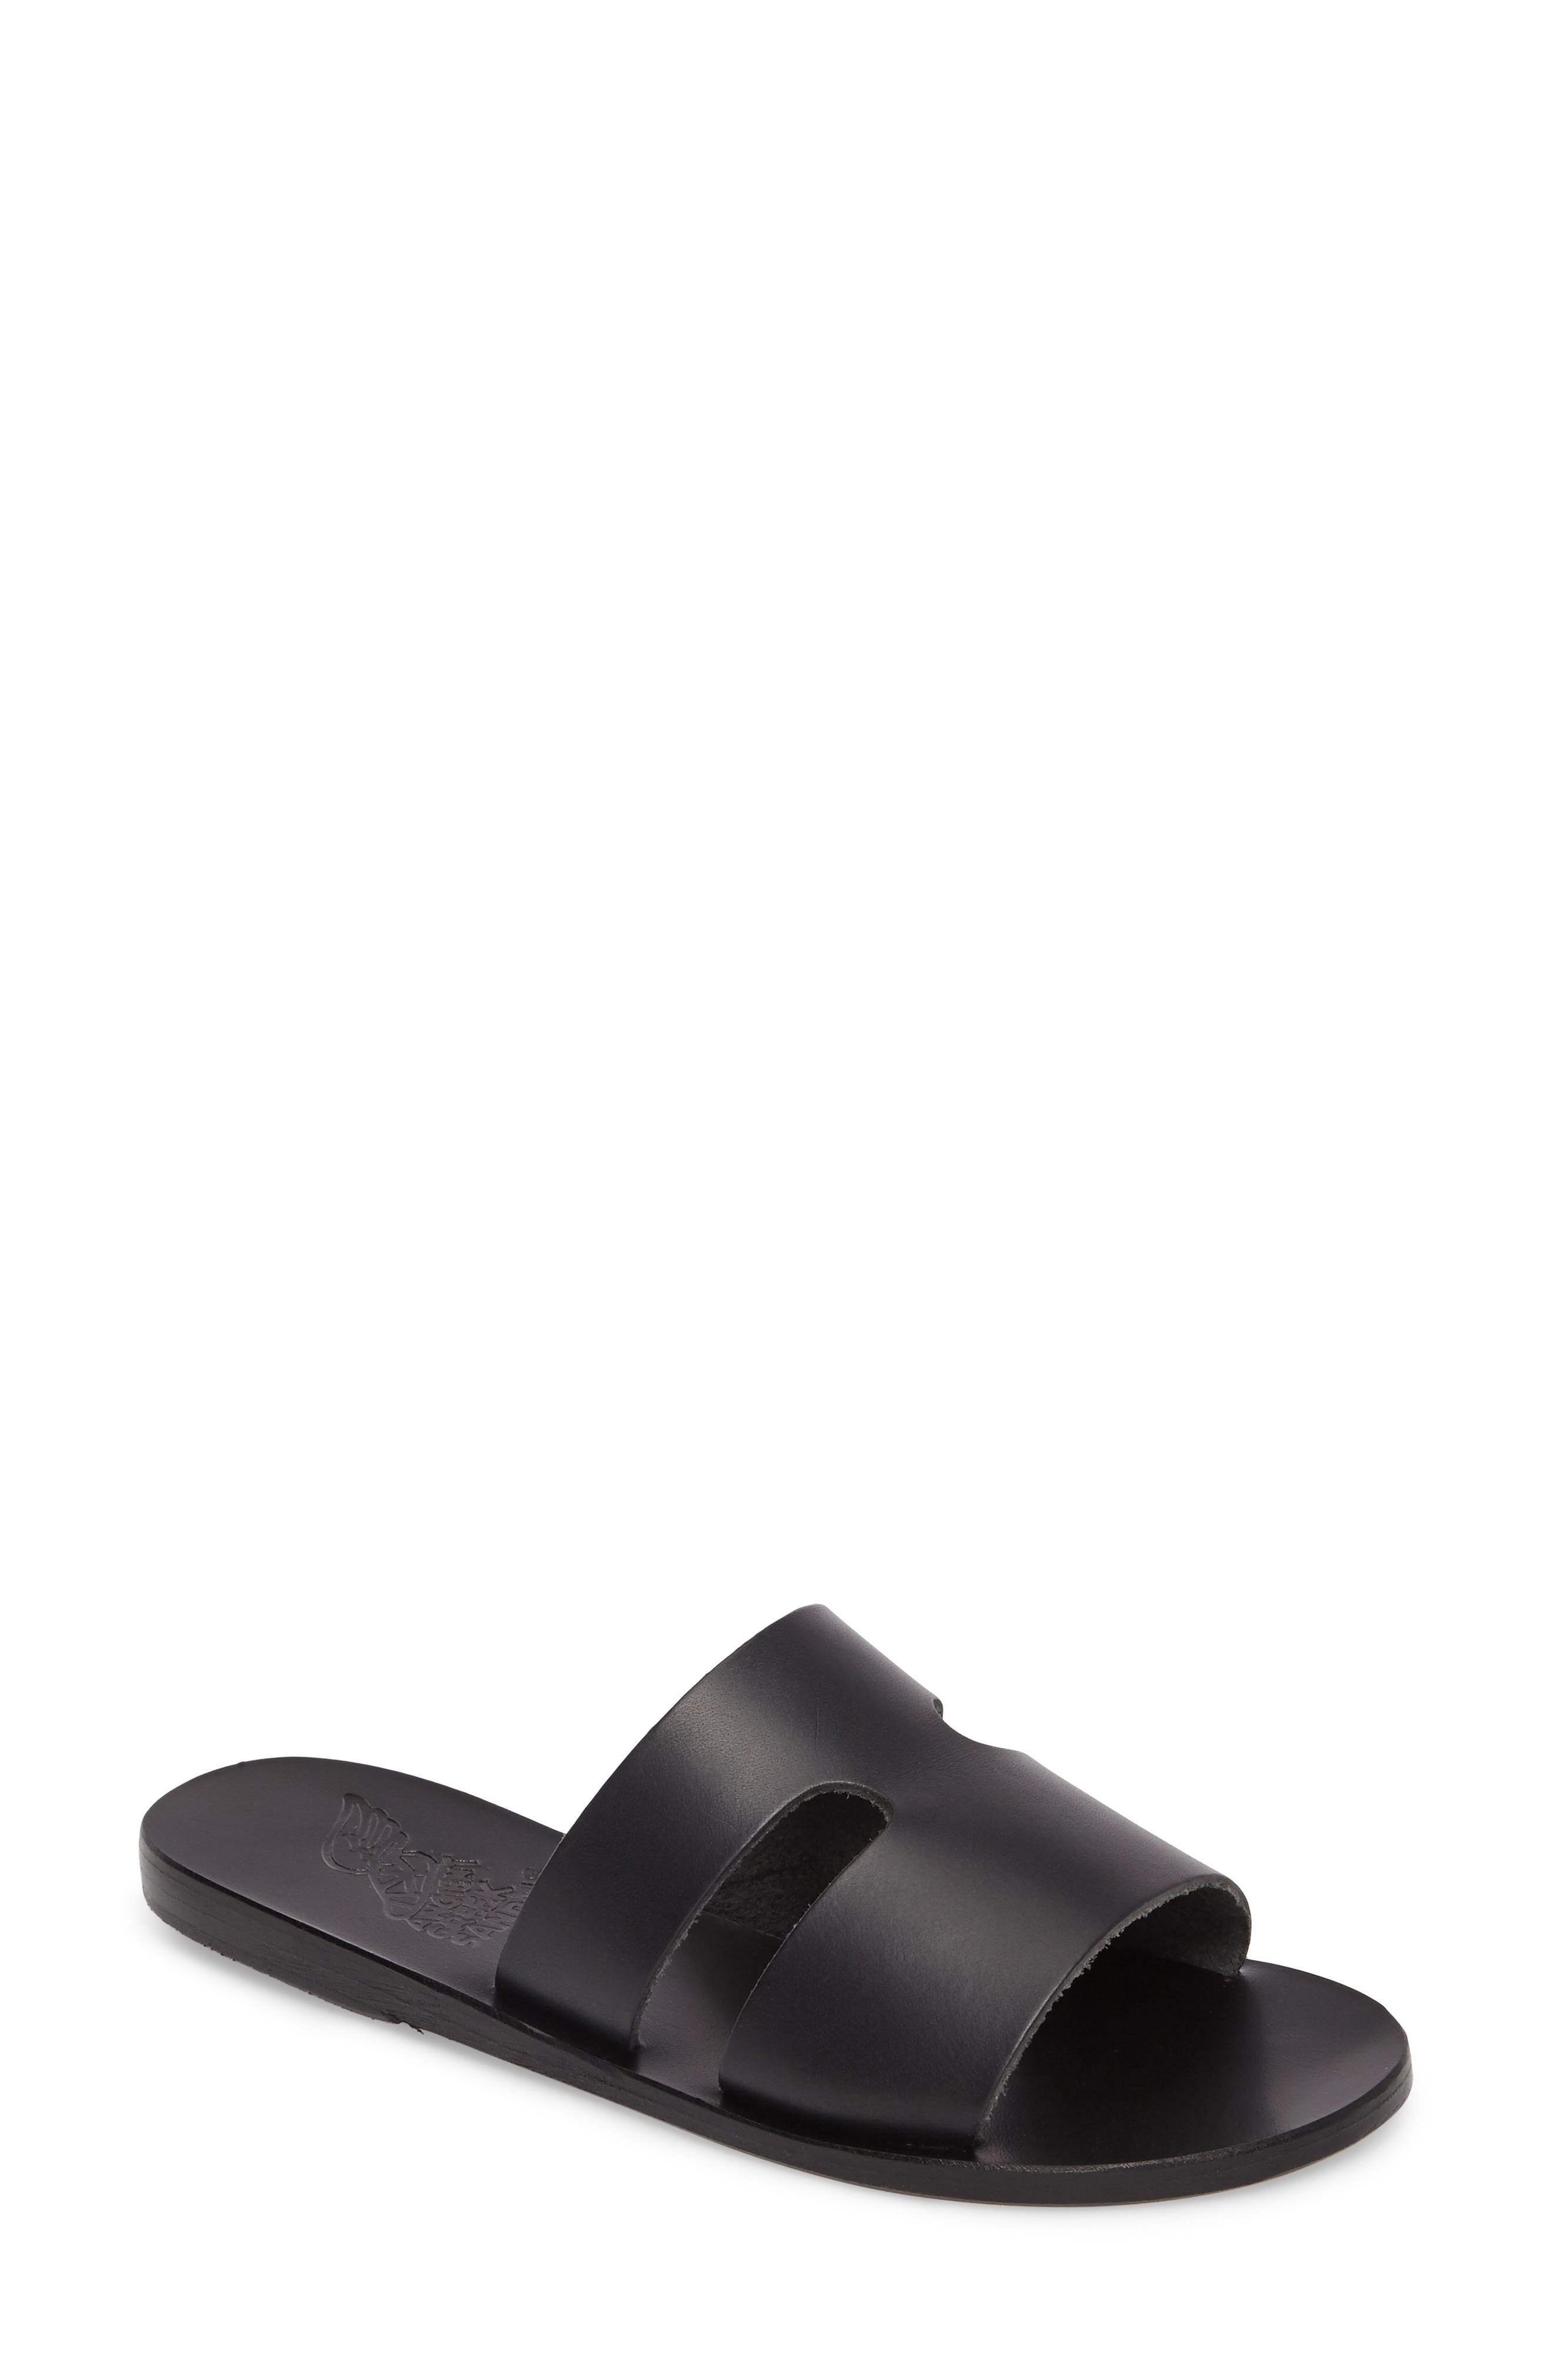 Apteros Genuine Calf Hair Slide Sandal,                         Main,                         color, 001